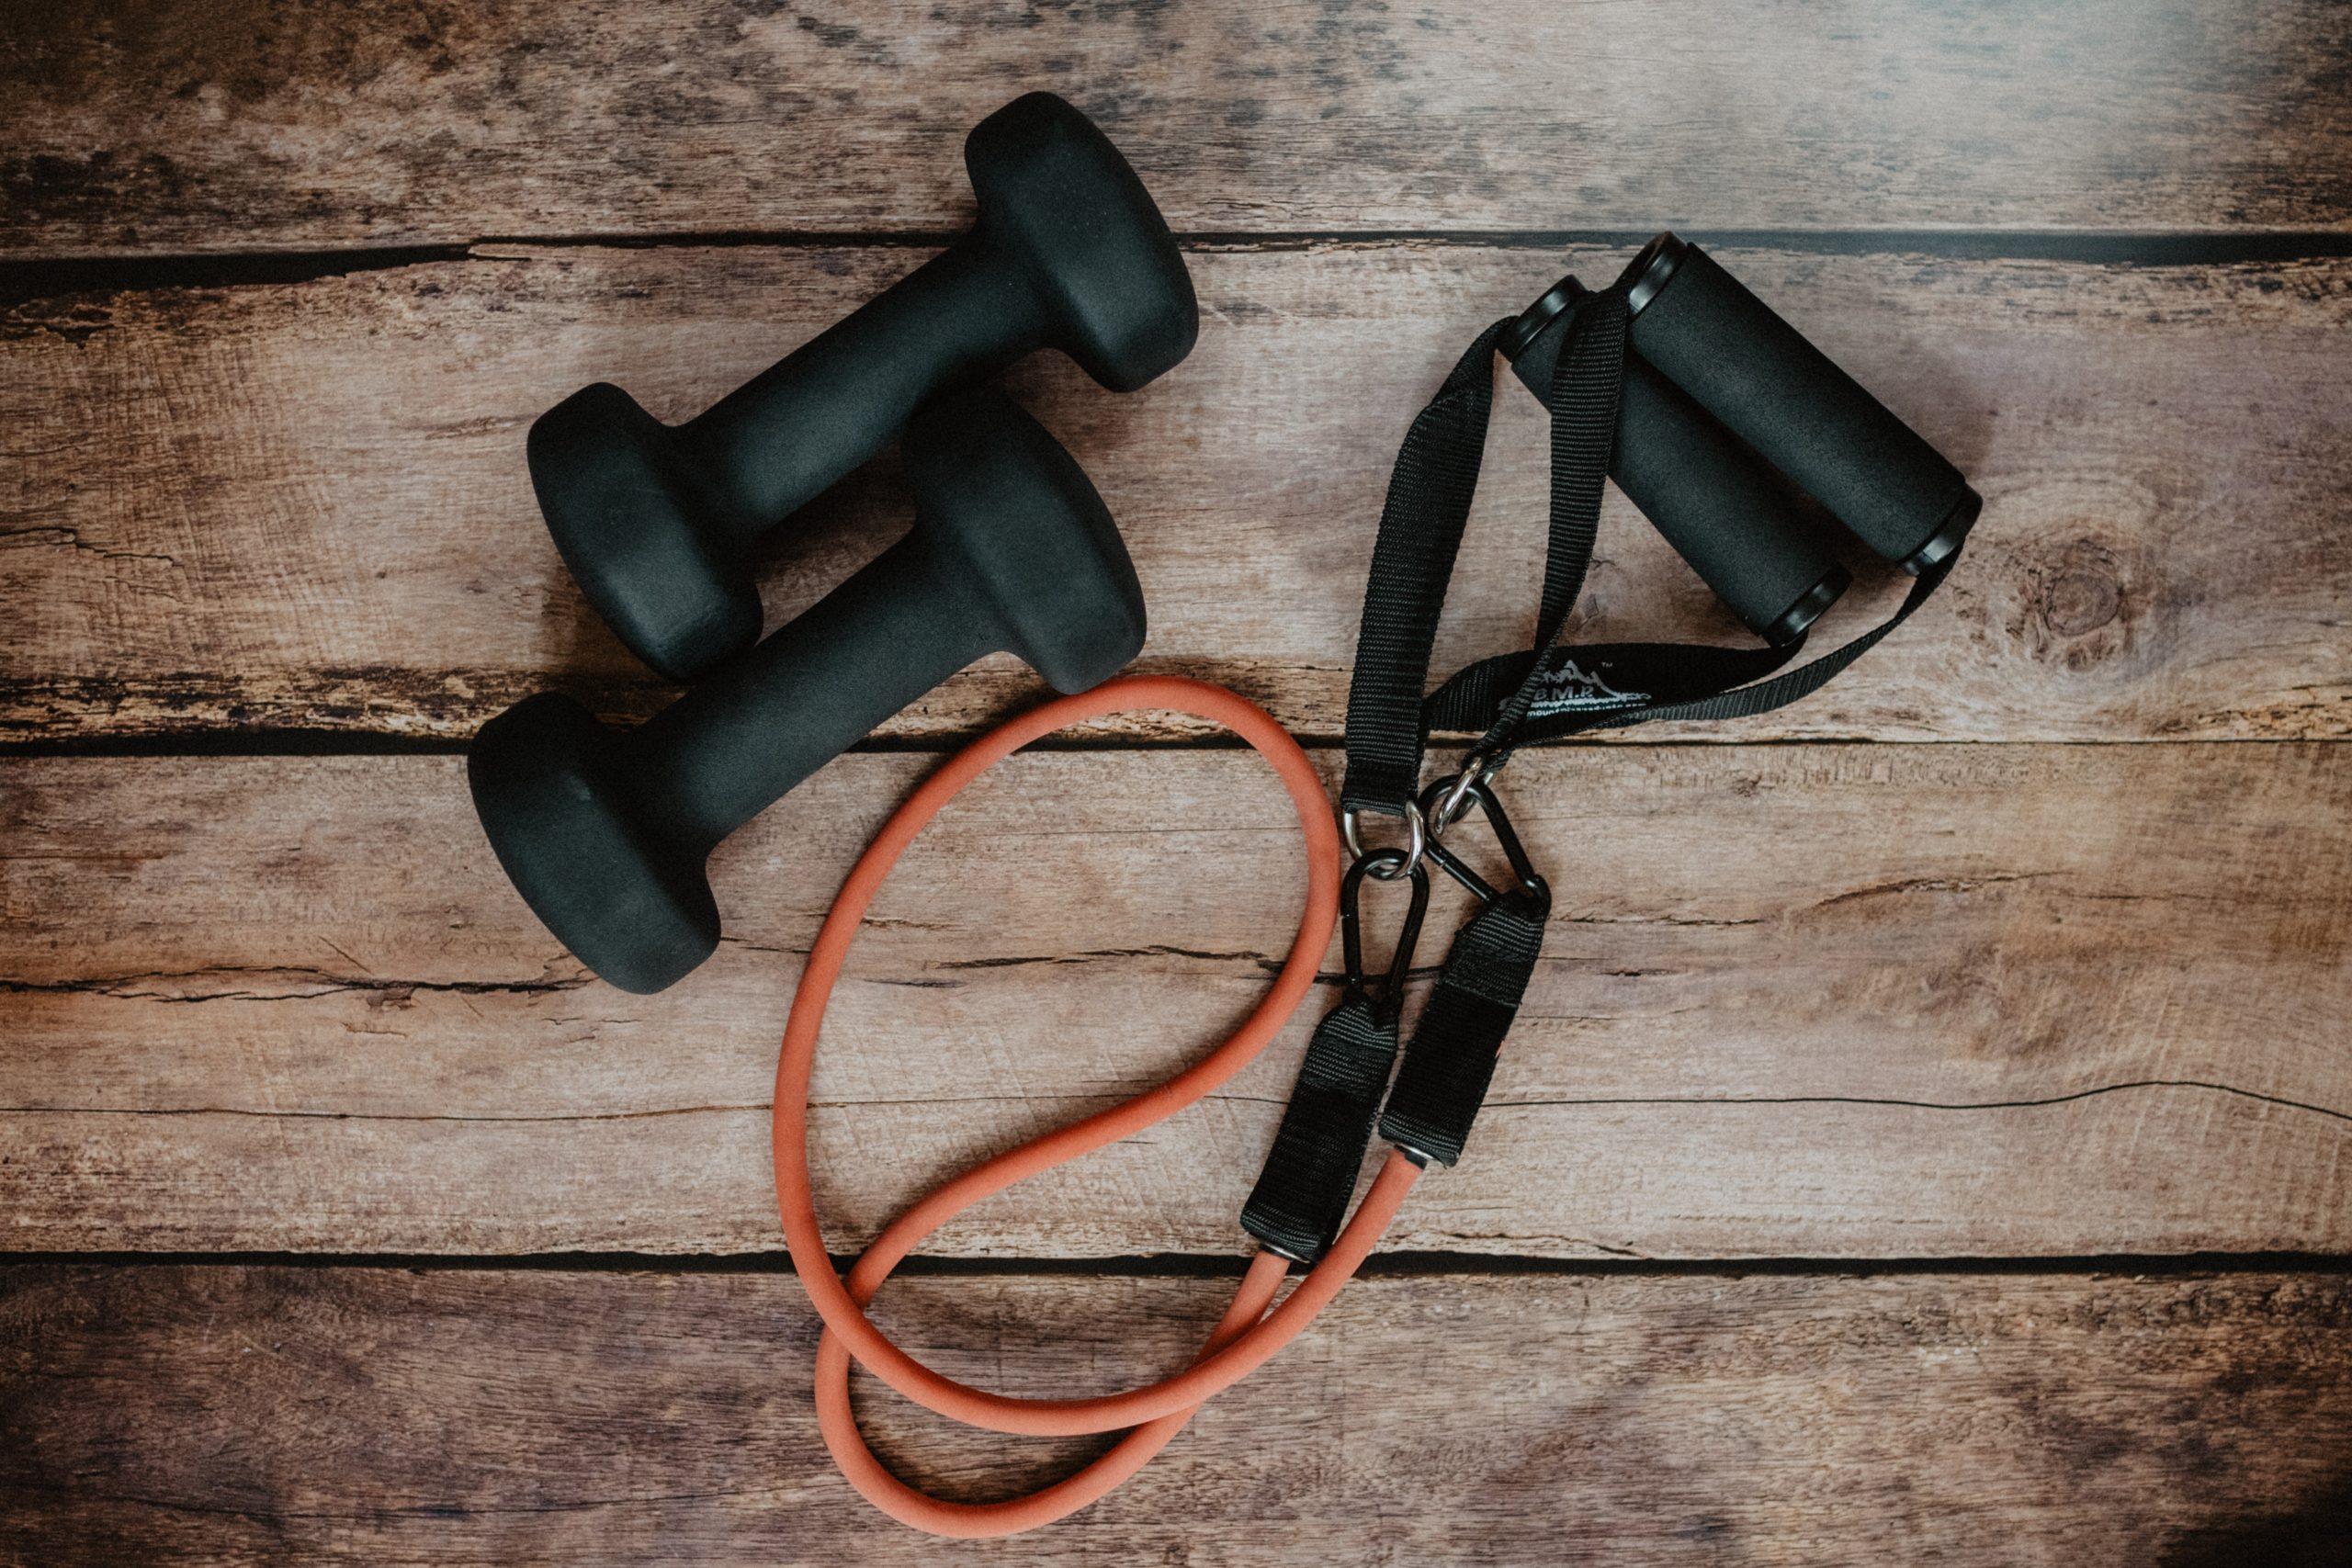 Online exercise classes during lockdown